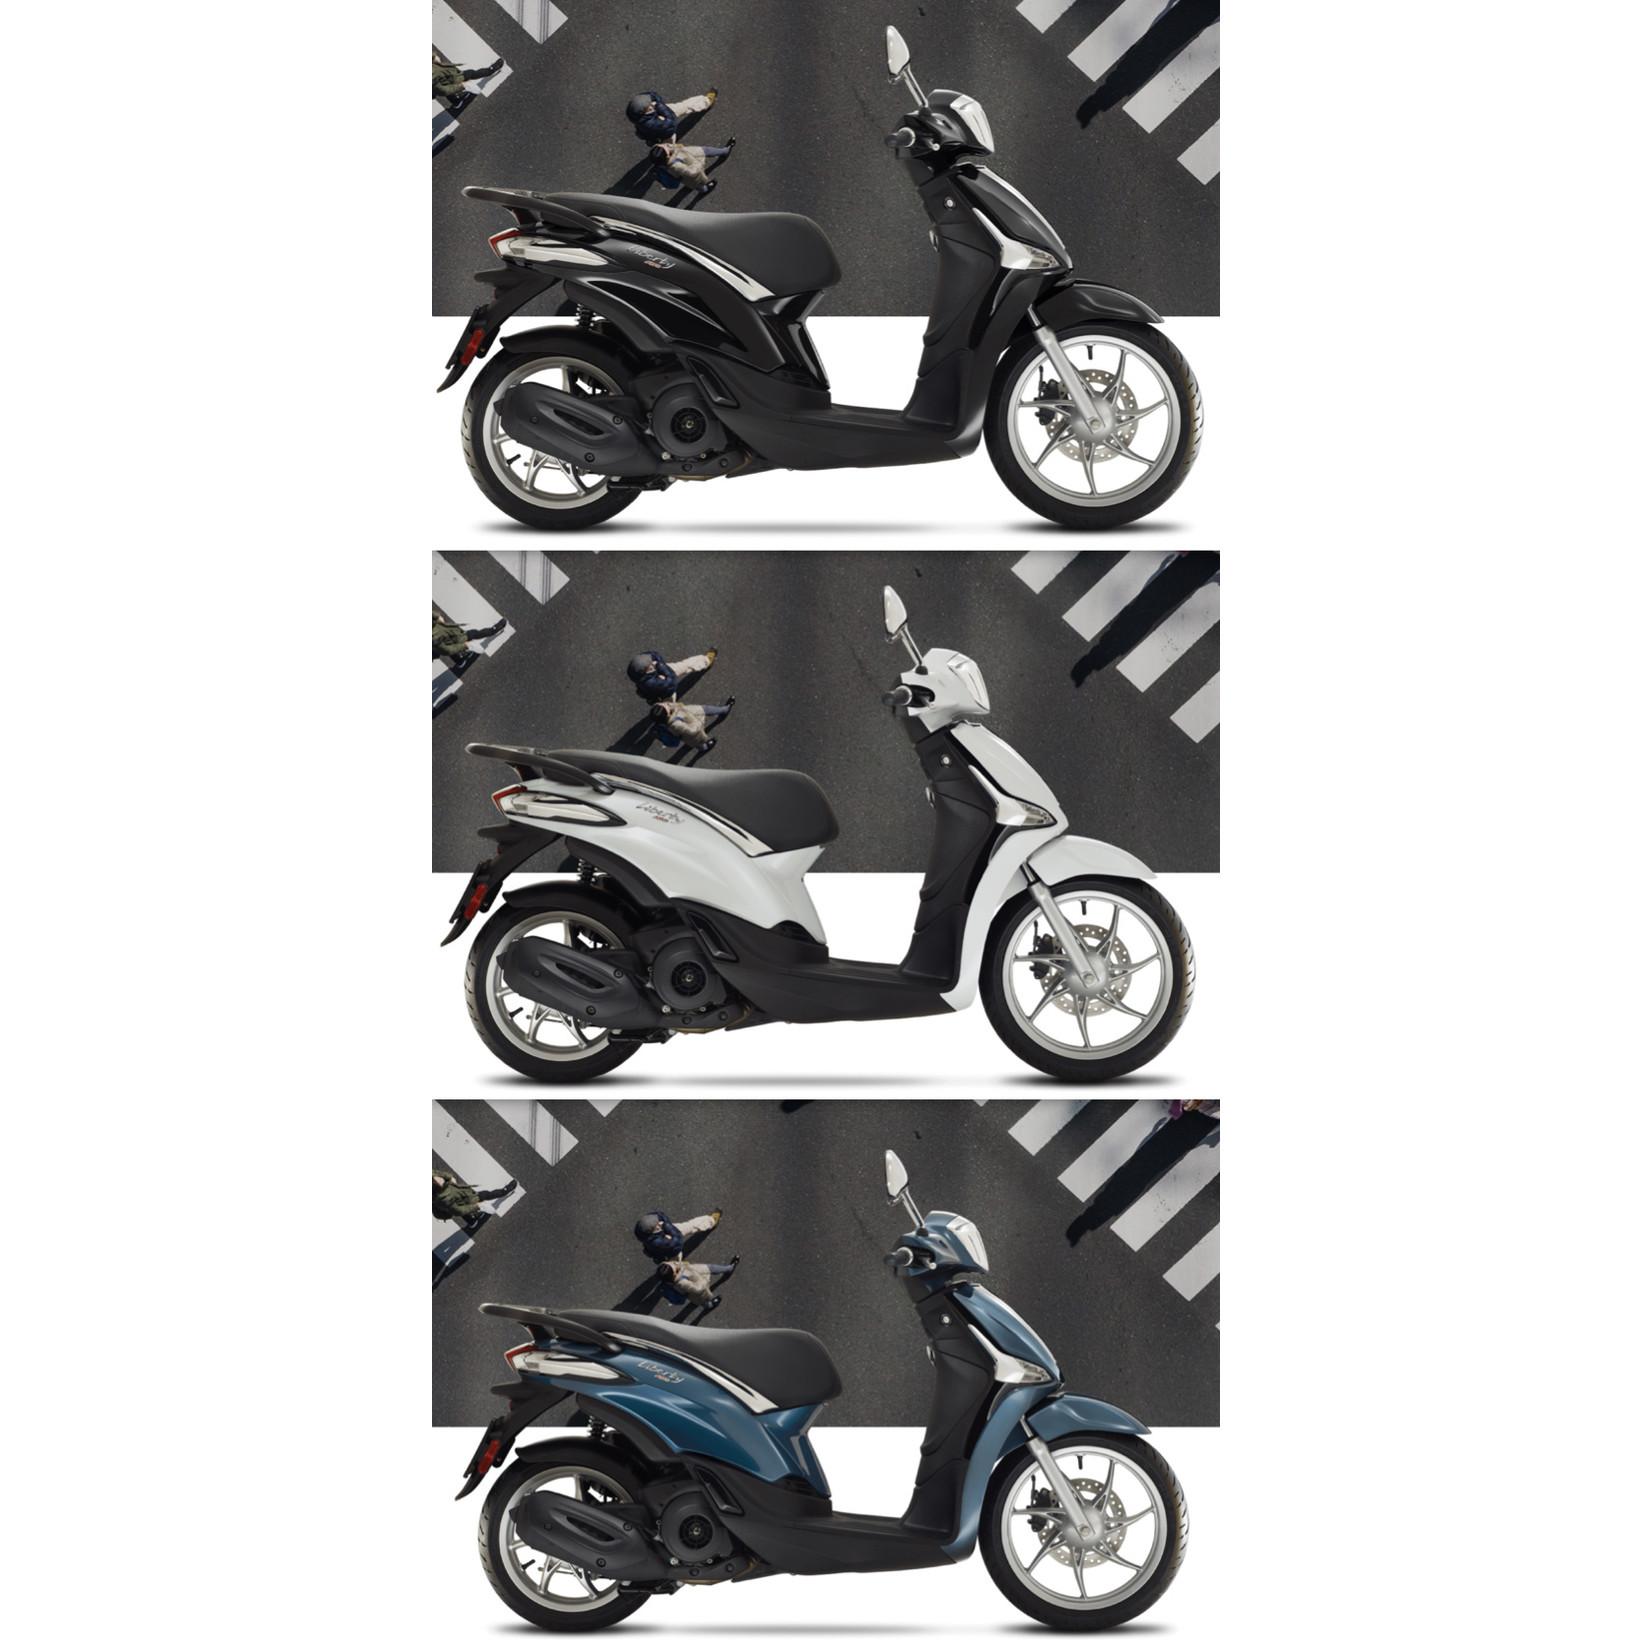 Vehicles Piaggio, 2022 Liberty iGET 50cc